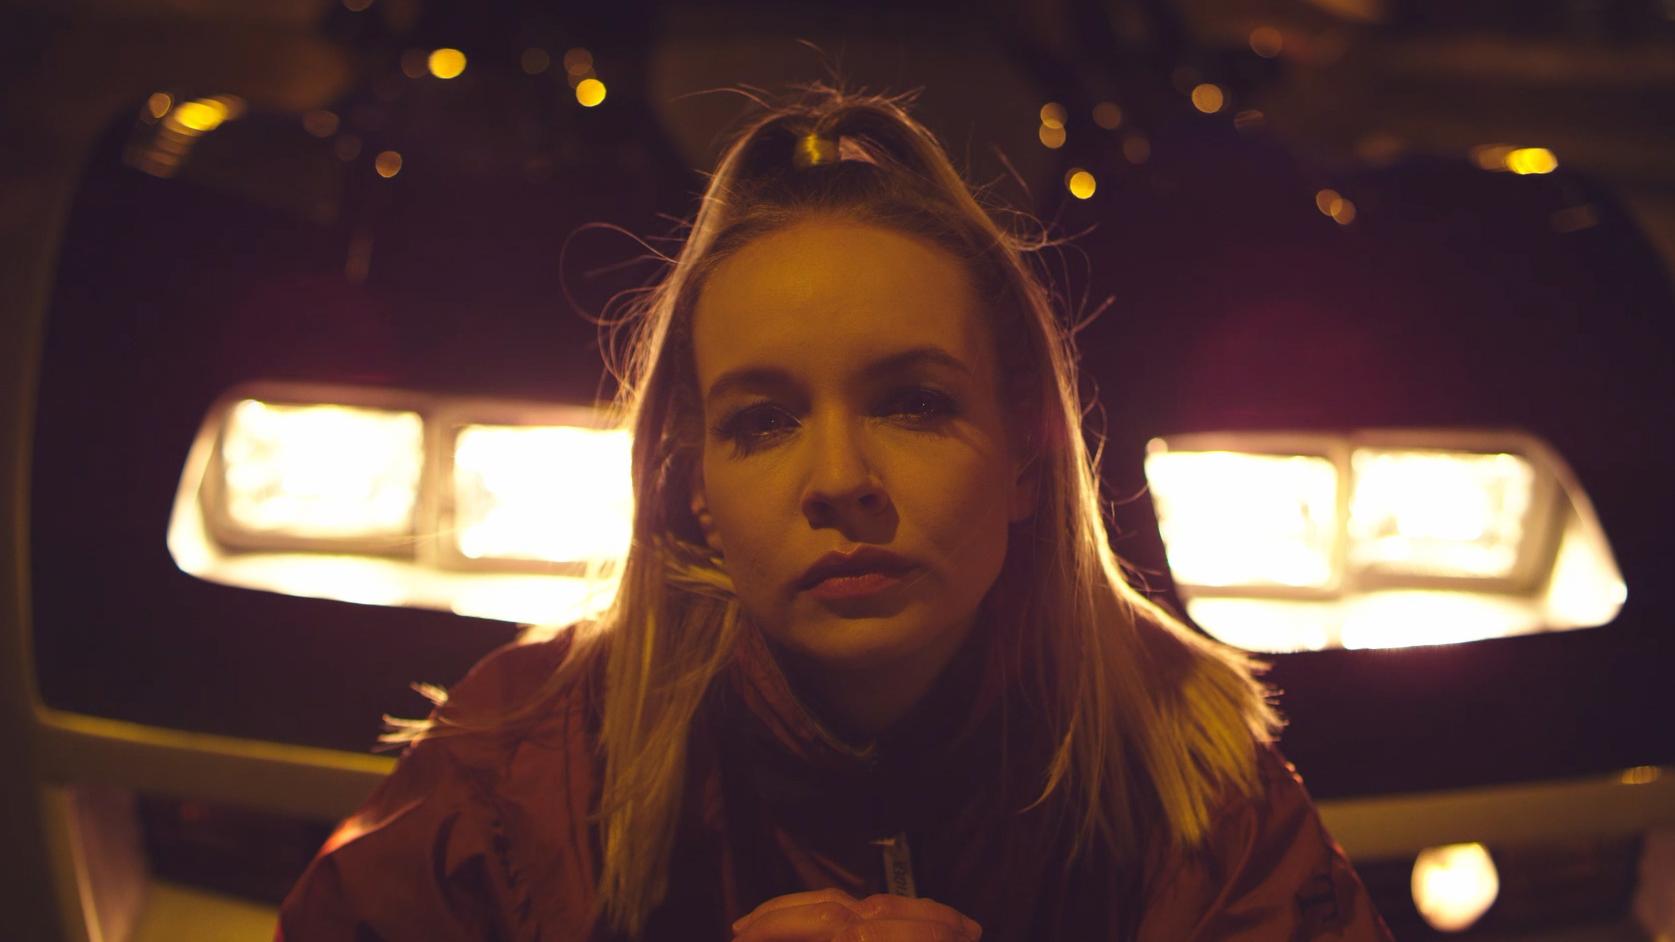 Karpe Diem om P3-remiks: – Kan forandre norsk rap